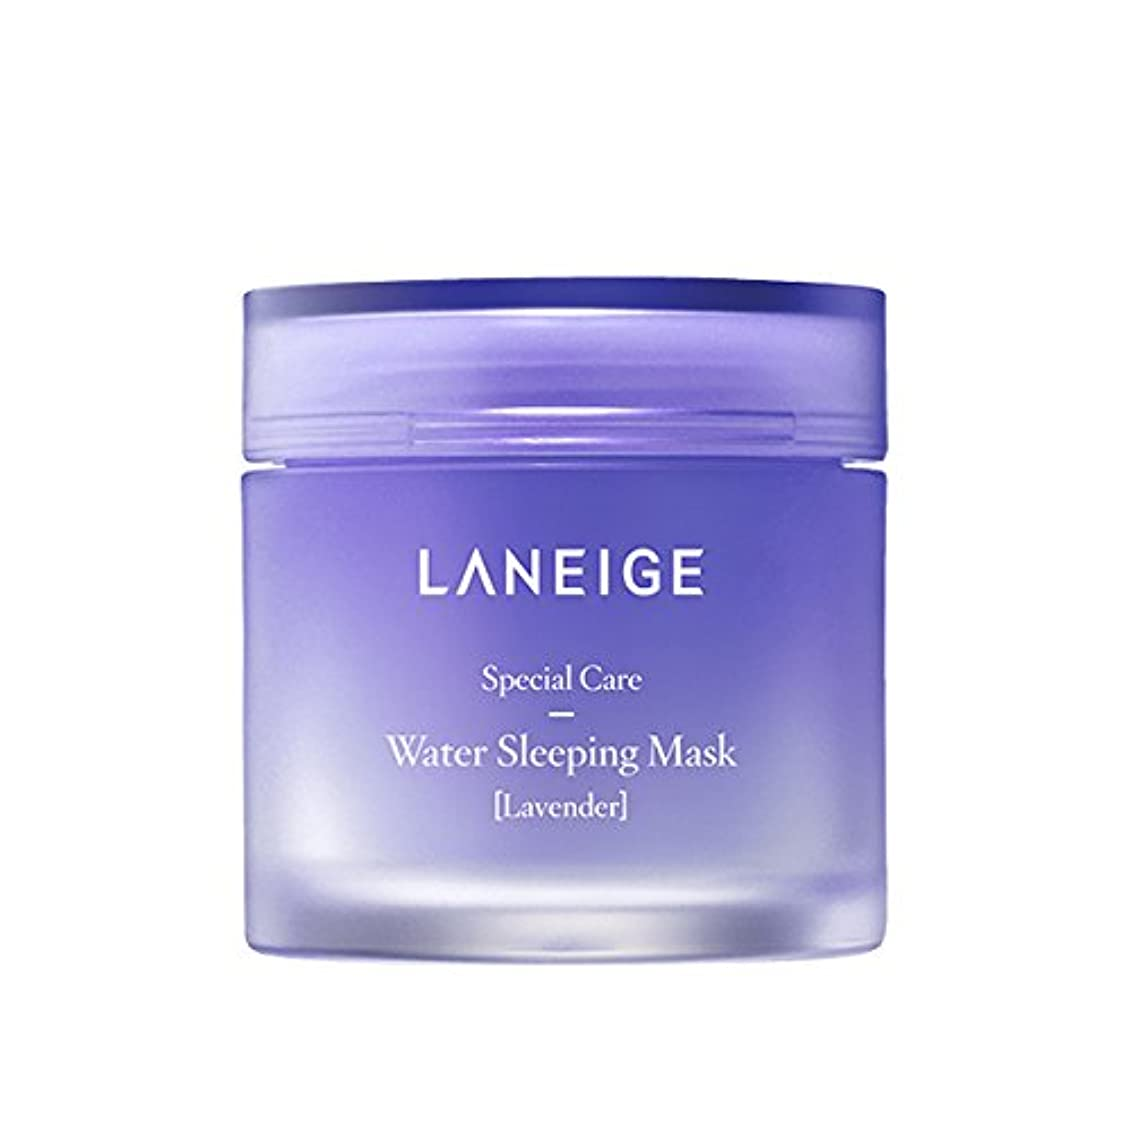 LANEIGE Water Sleeping Mask [Lavender] 70ml/ラネージュ ウォーター スリーピング マスク [ラベンダー] 70ml [並行輸入品]